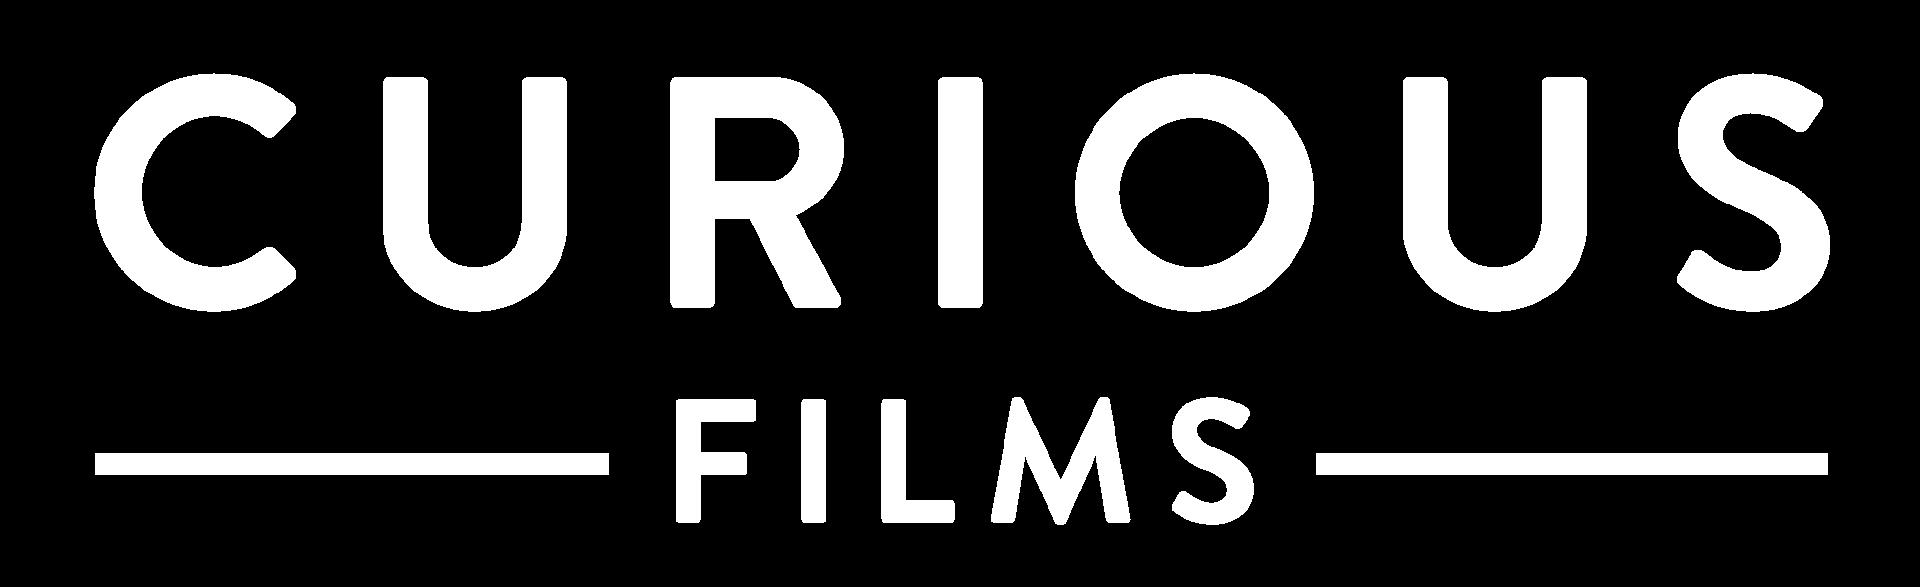 Curious Films is a premium factual television production company